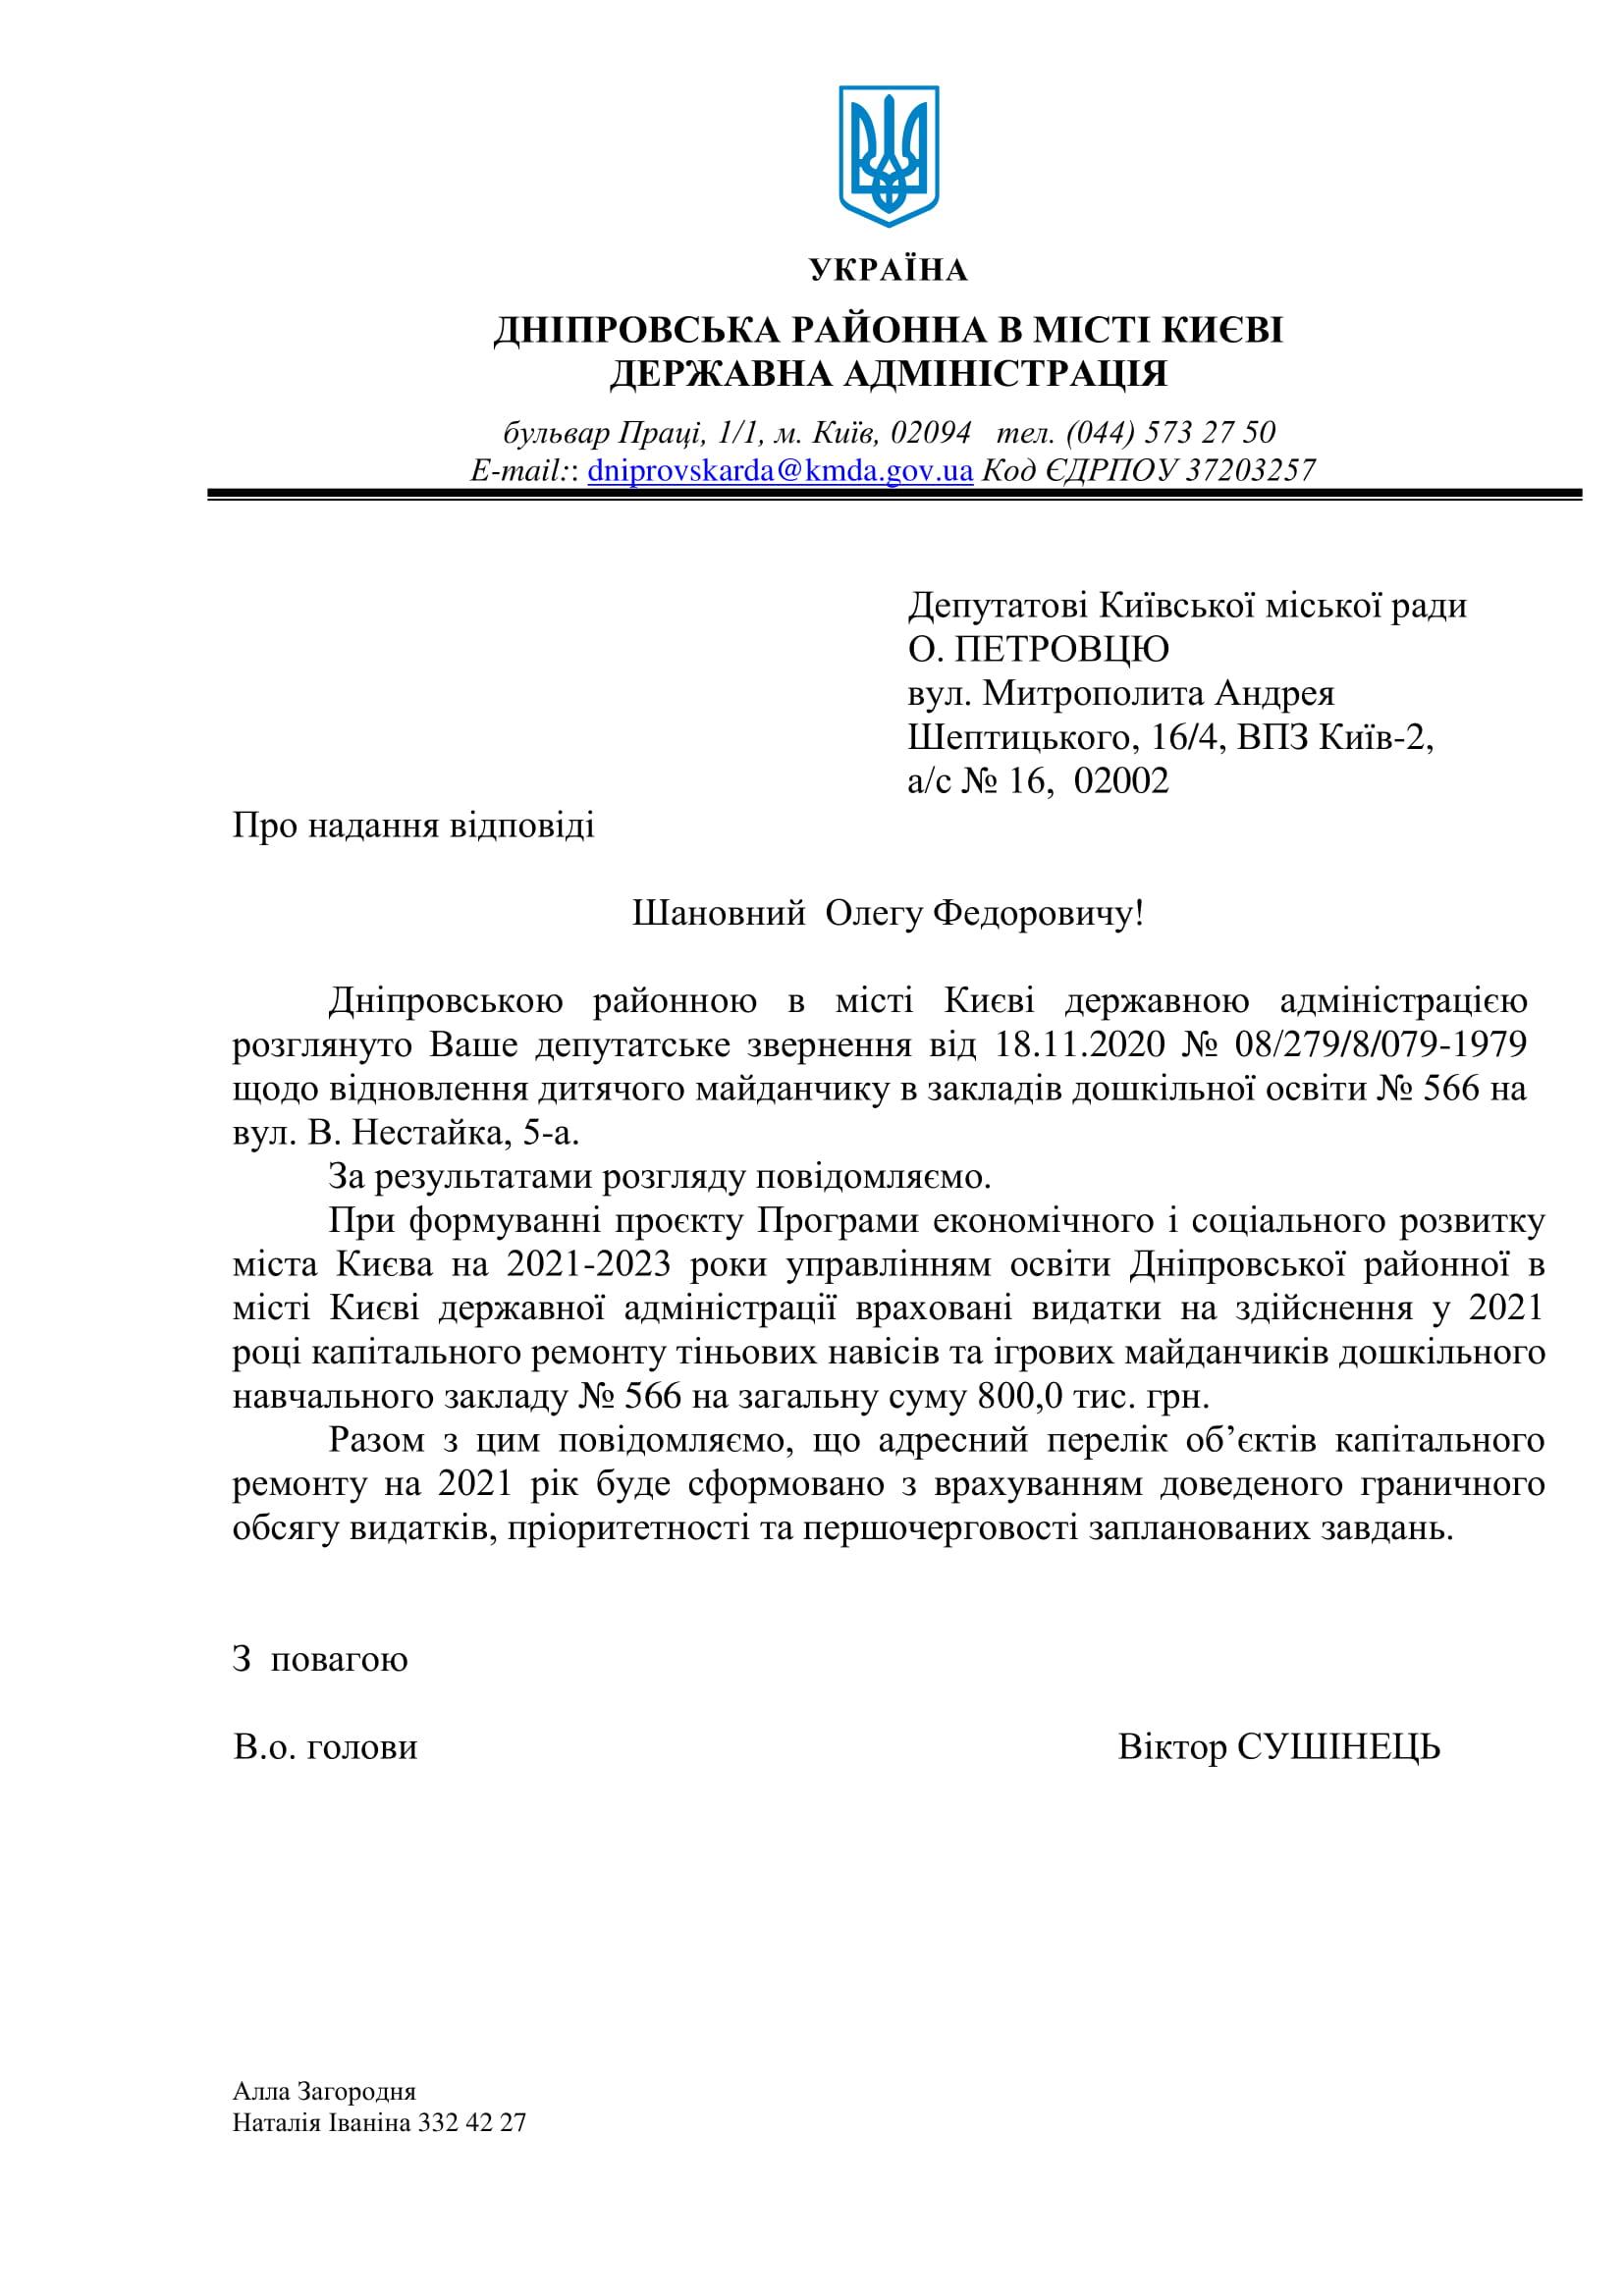 Деп_Петровець__ДНЗ_566-1